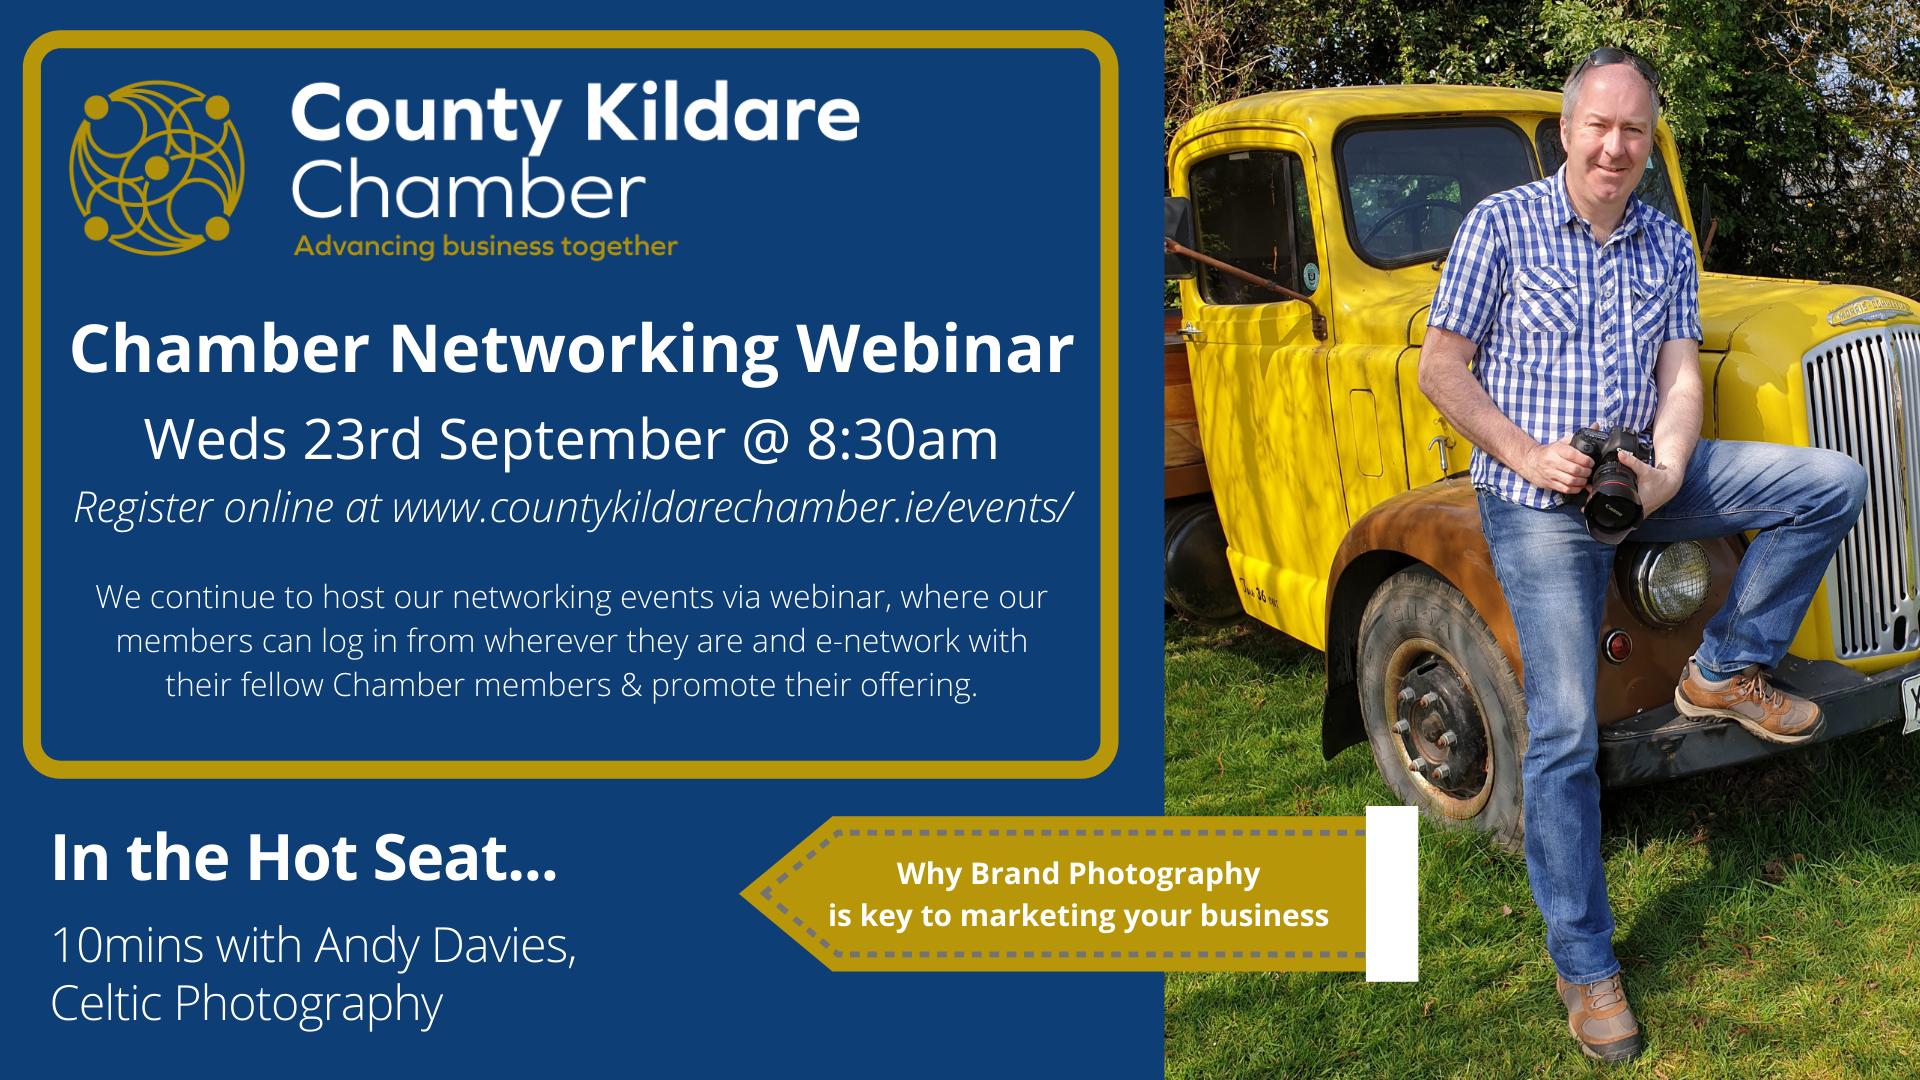 09/23/2020 - Chamber Networking Webinar